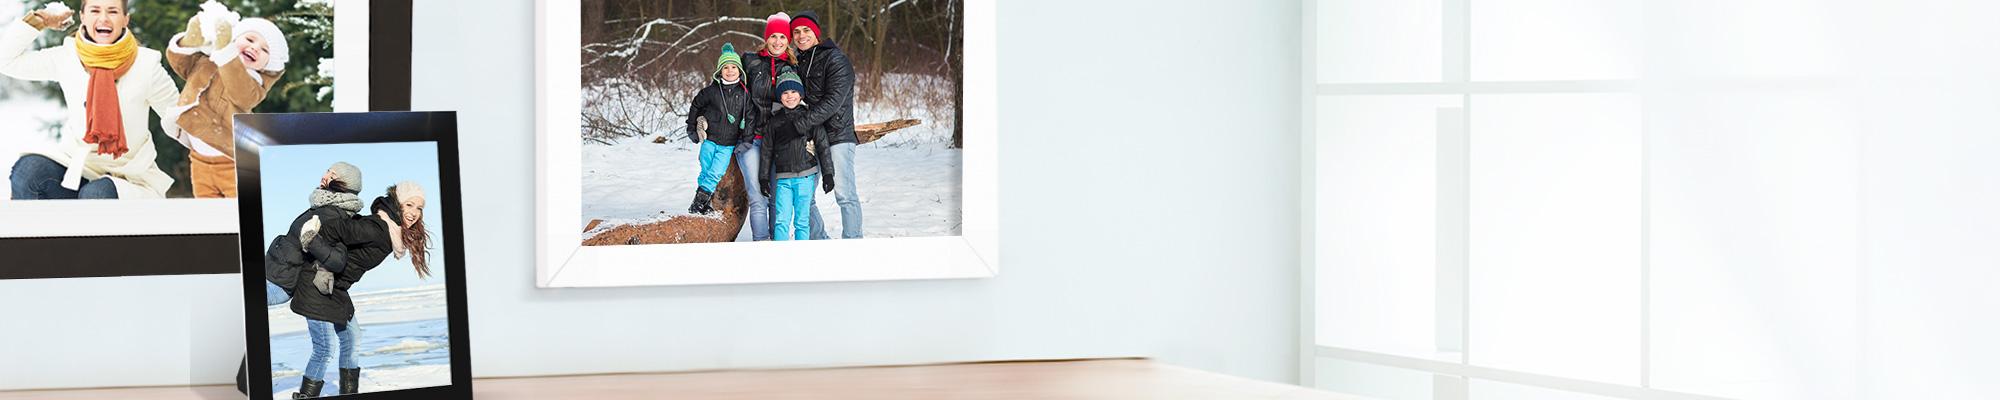 Framed Prints : Elegant framed prints make the perfect gift